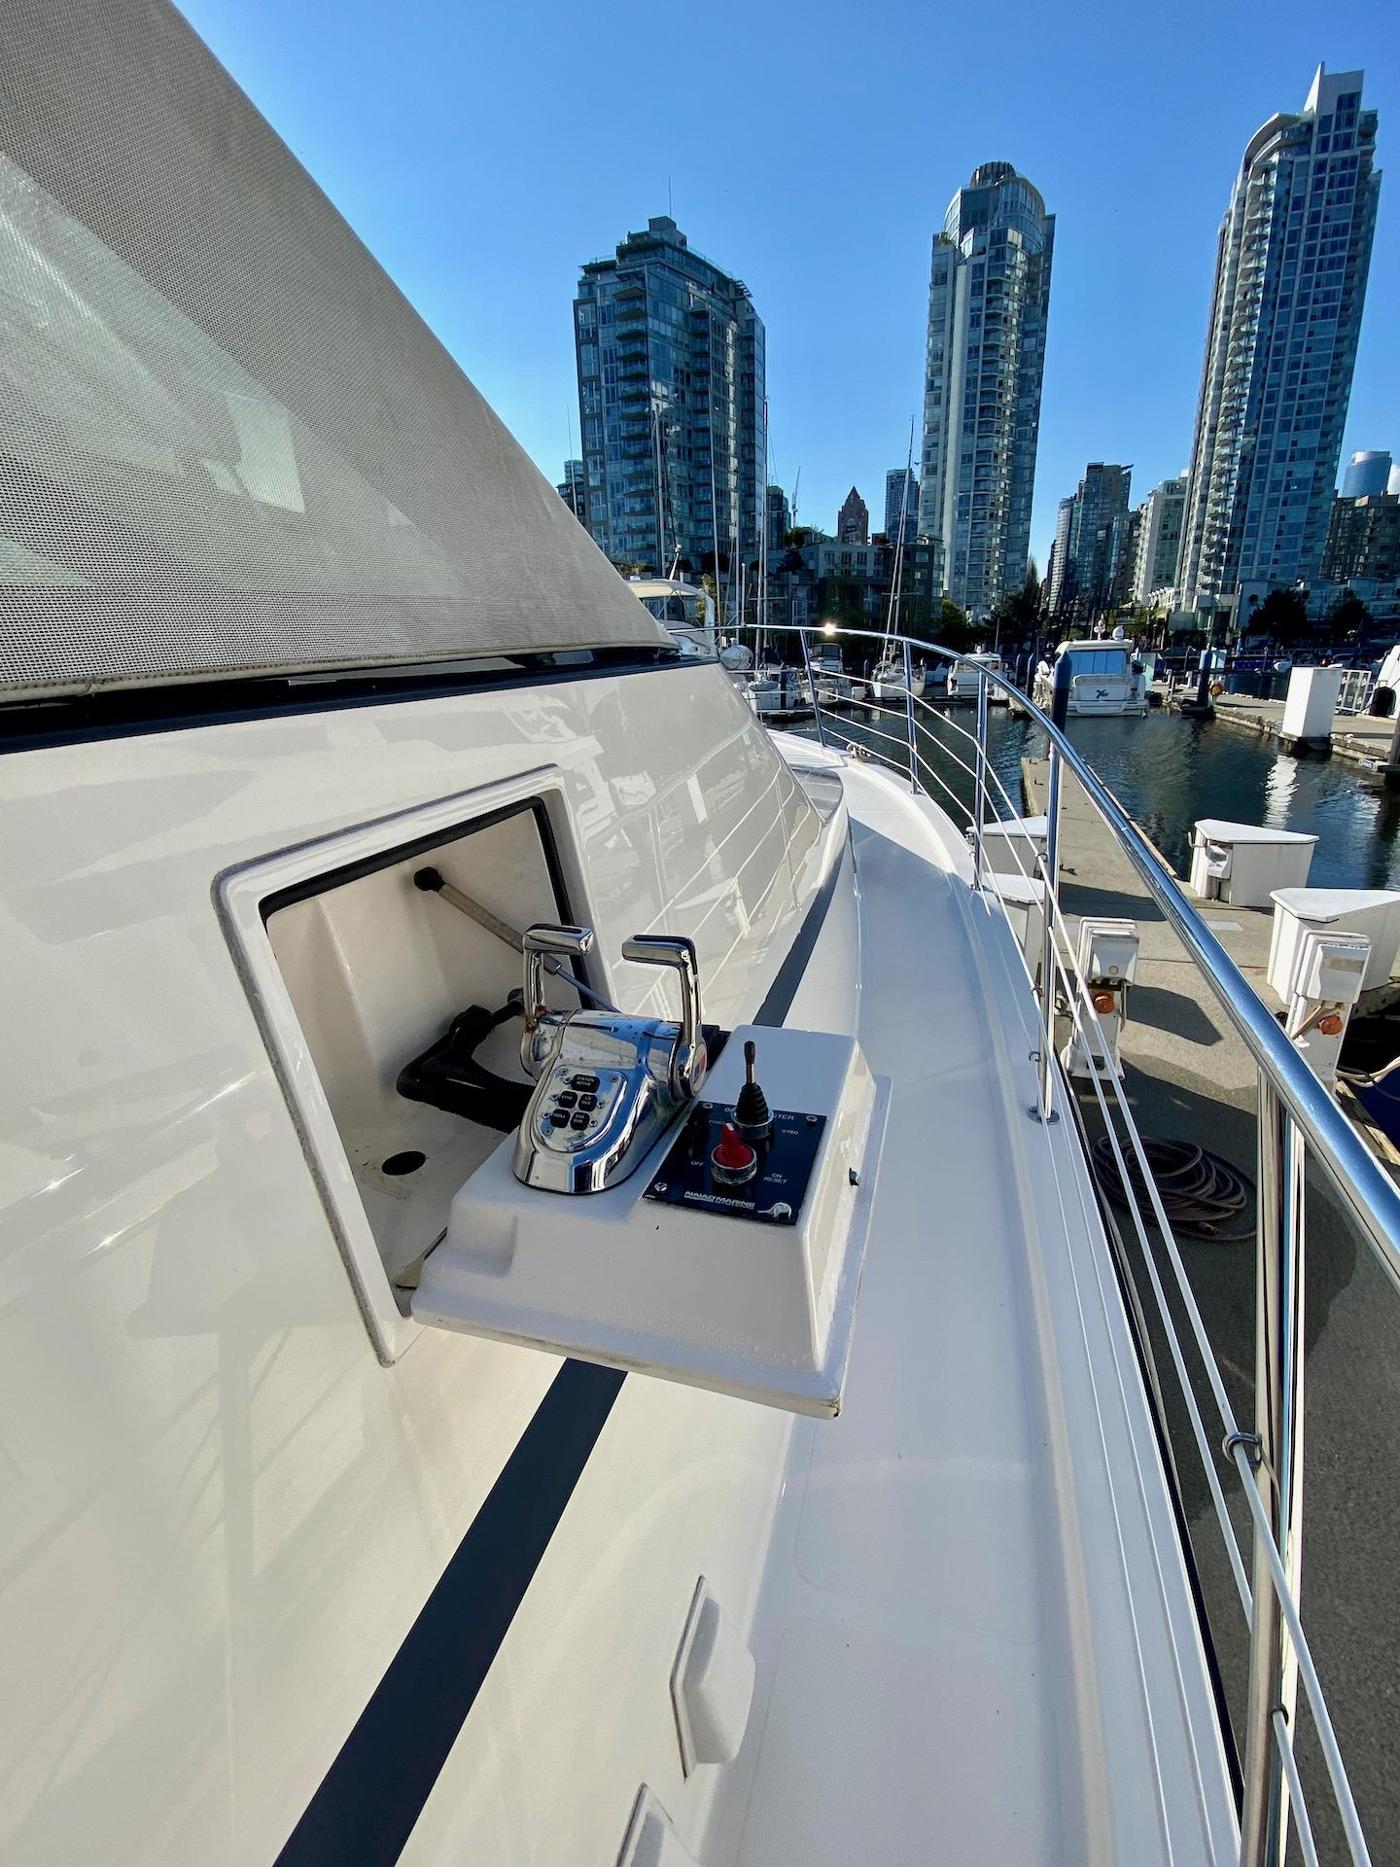 2004 Pacific Mariner 65 Diamond, Starboard side deck